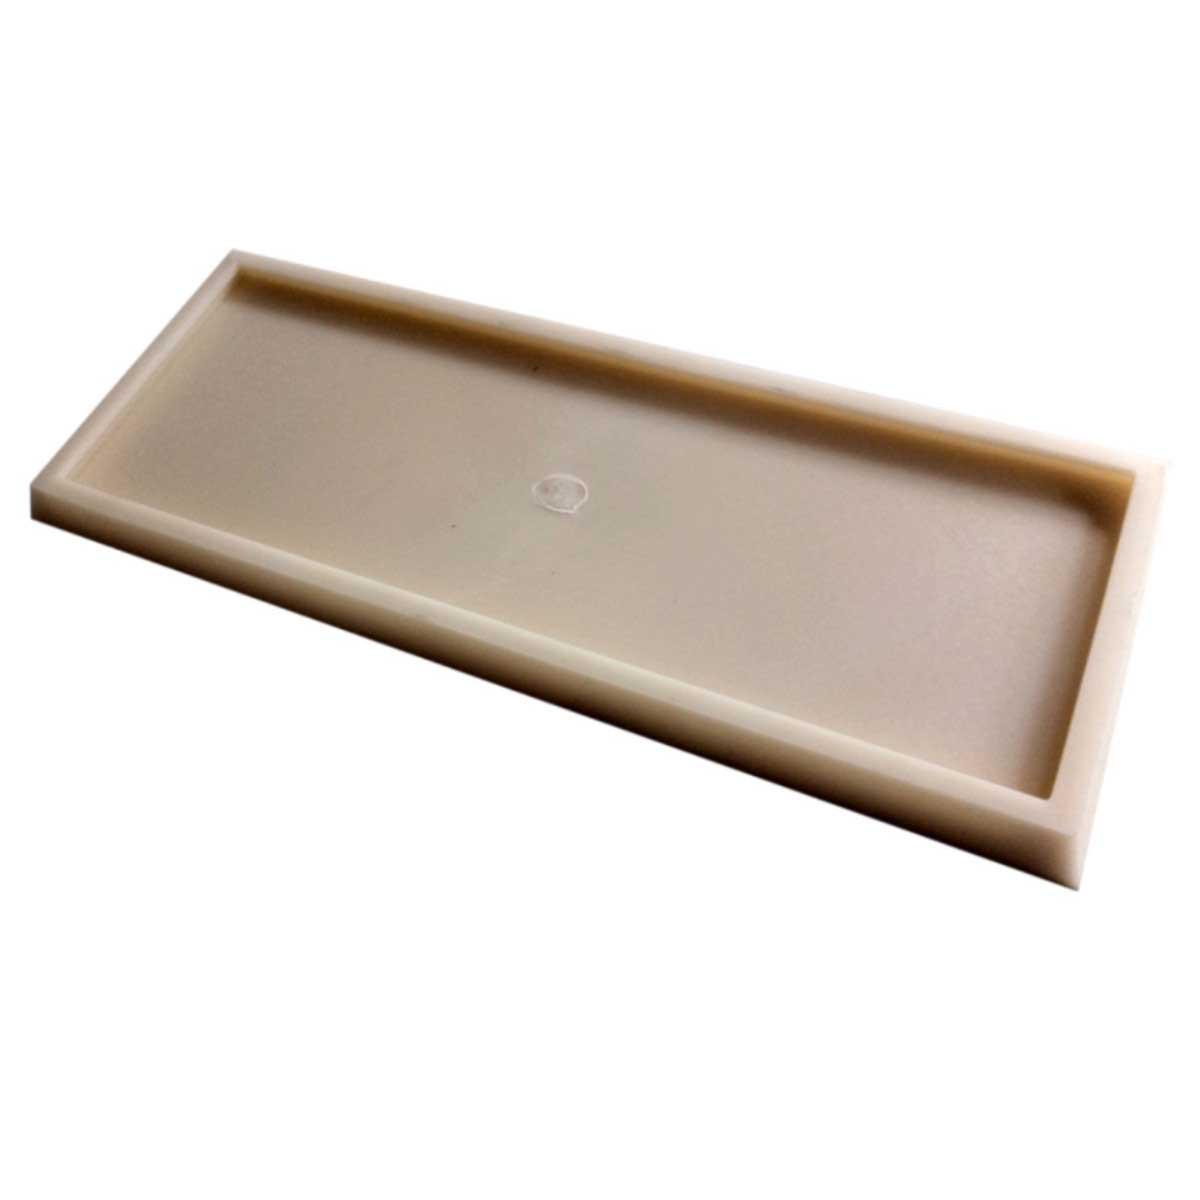 Raimondi Smart Grout Float pad